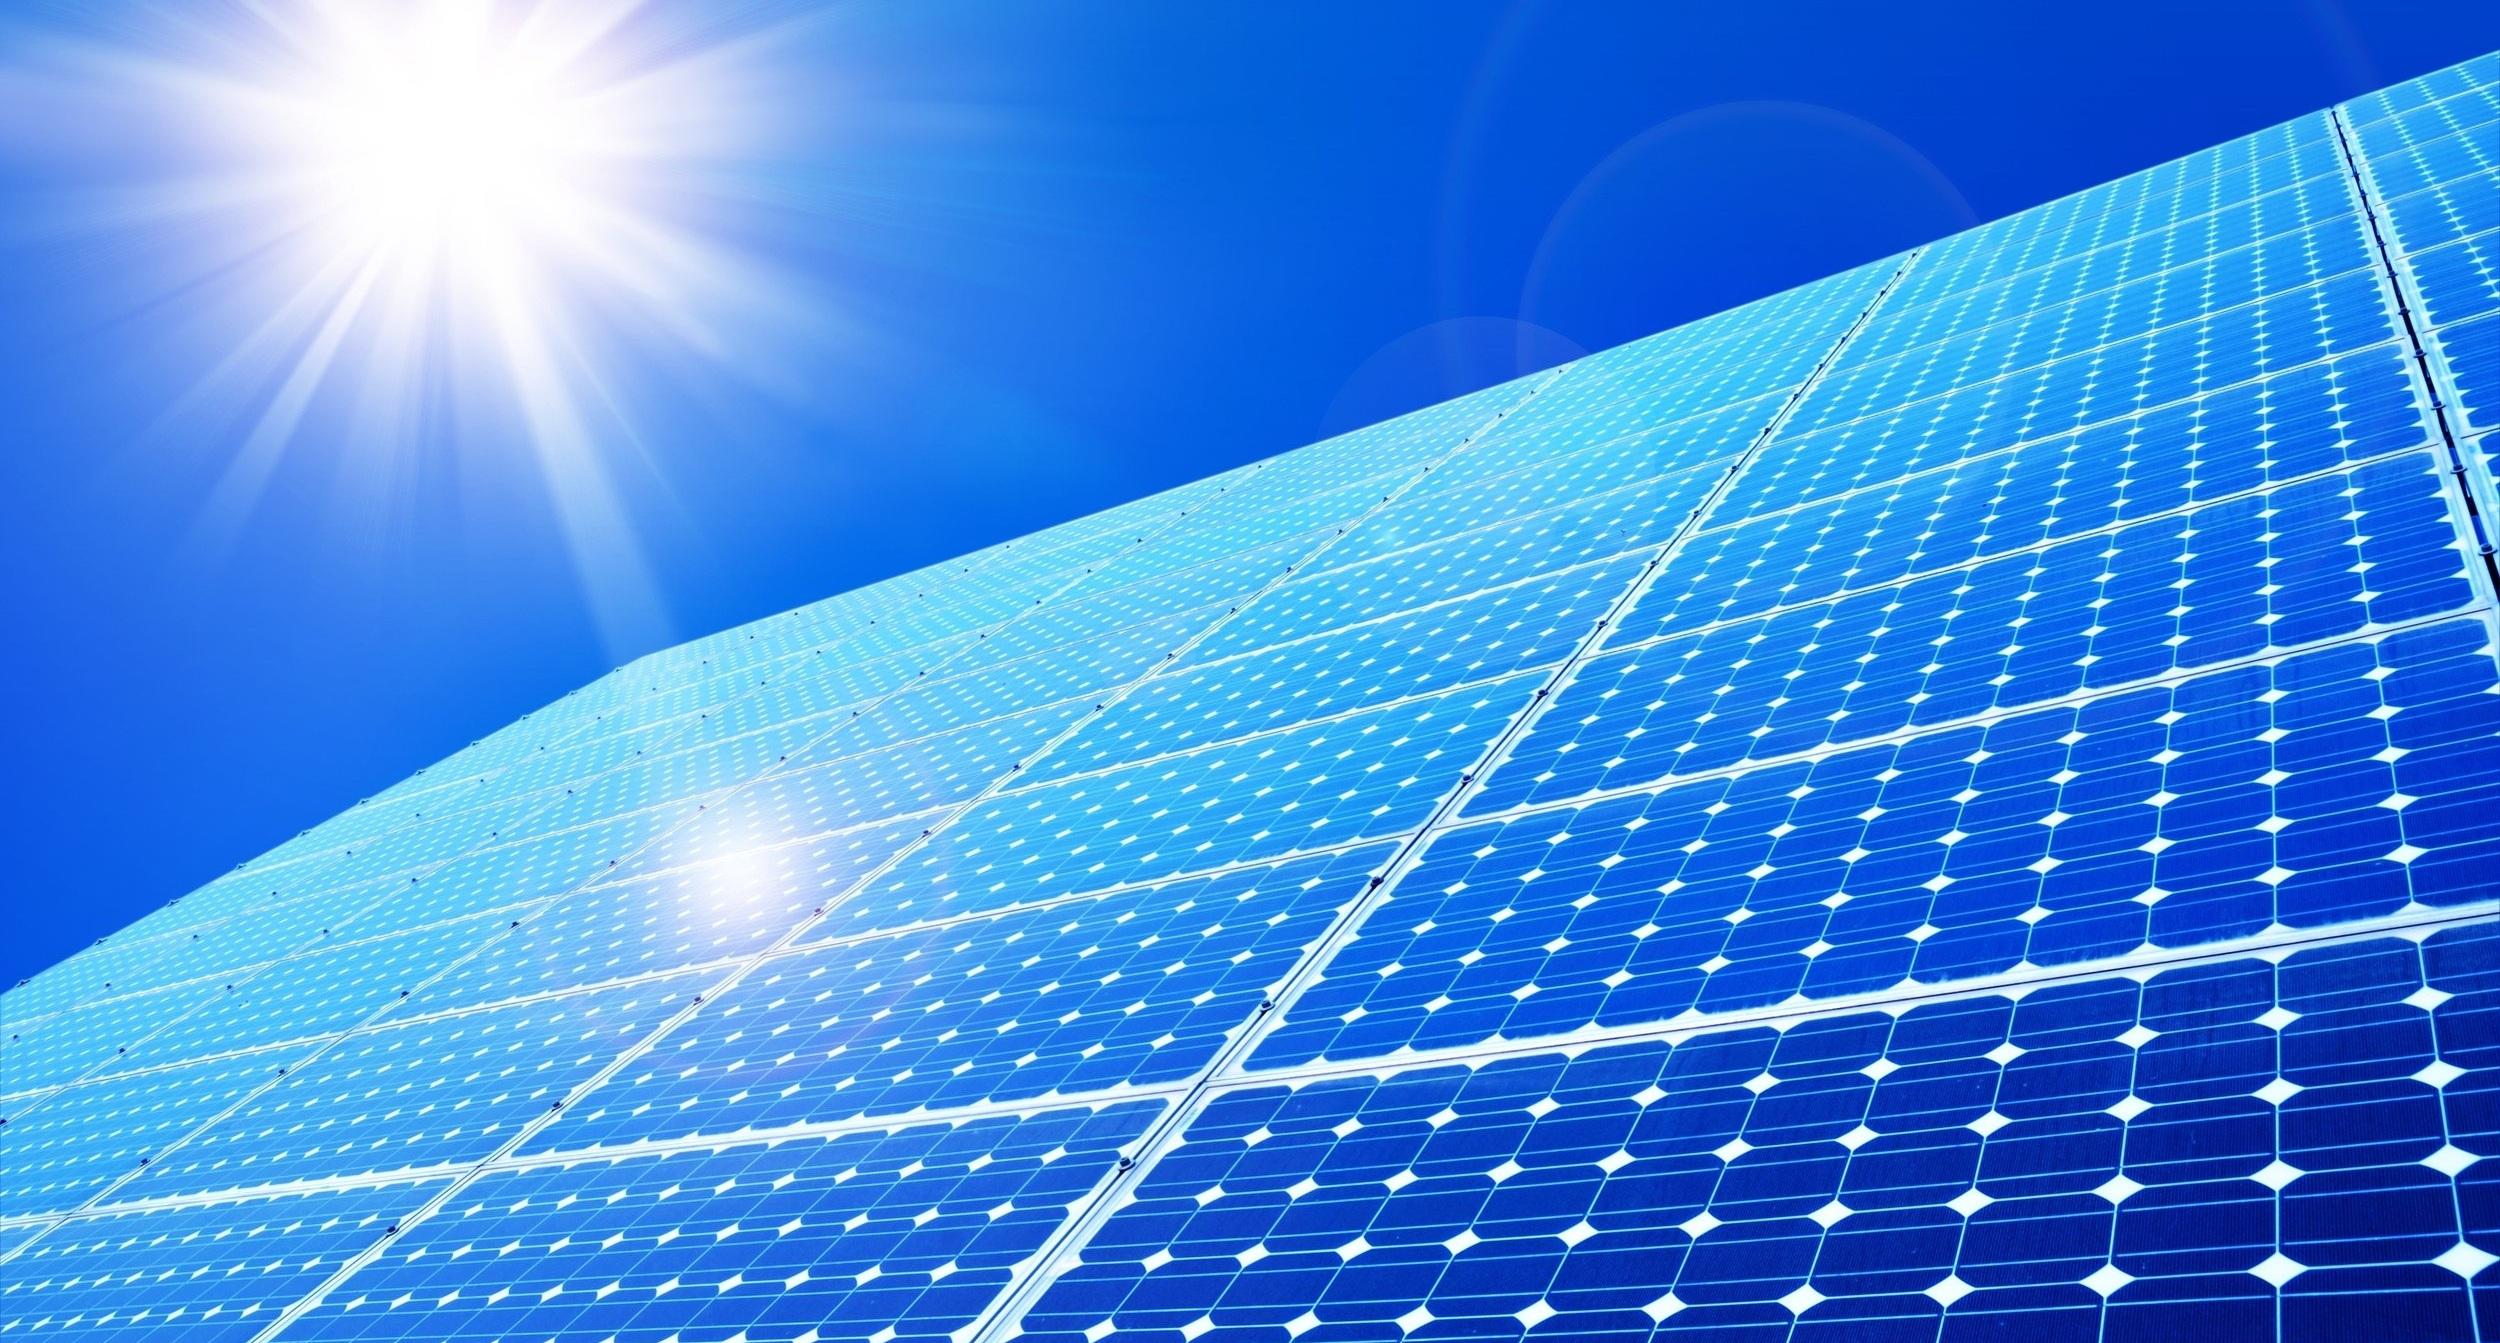 SOLAR PANELS - CLICK HERE